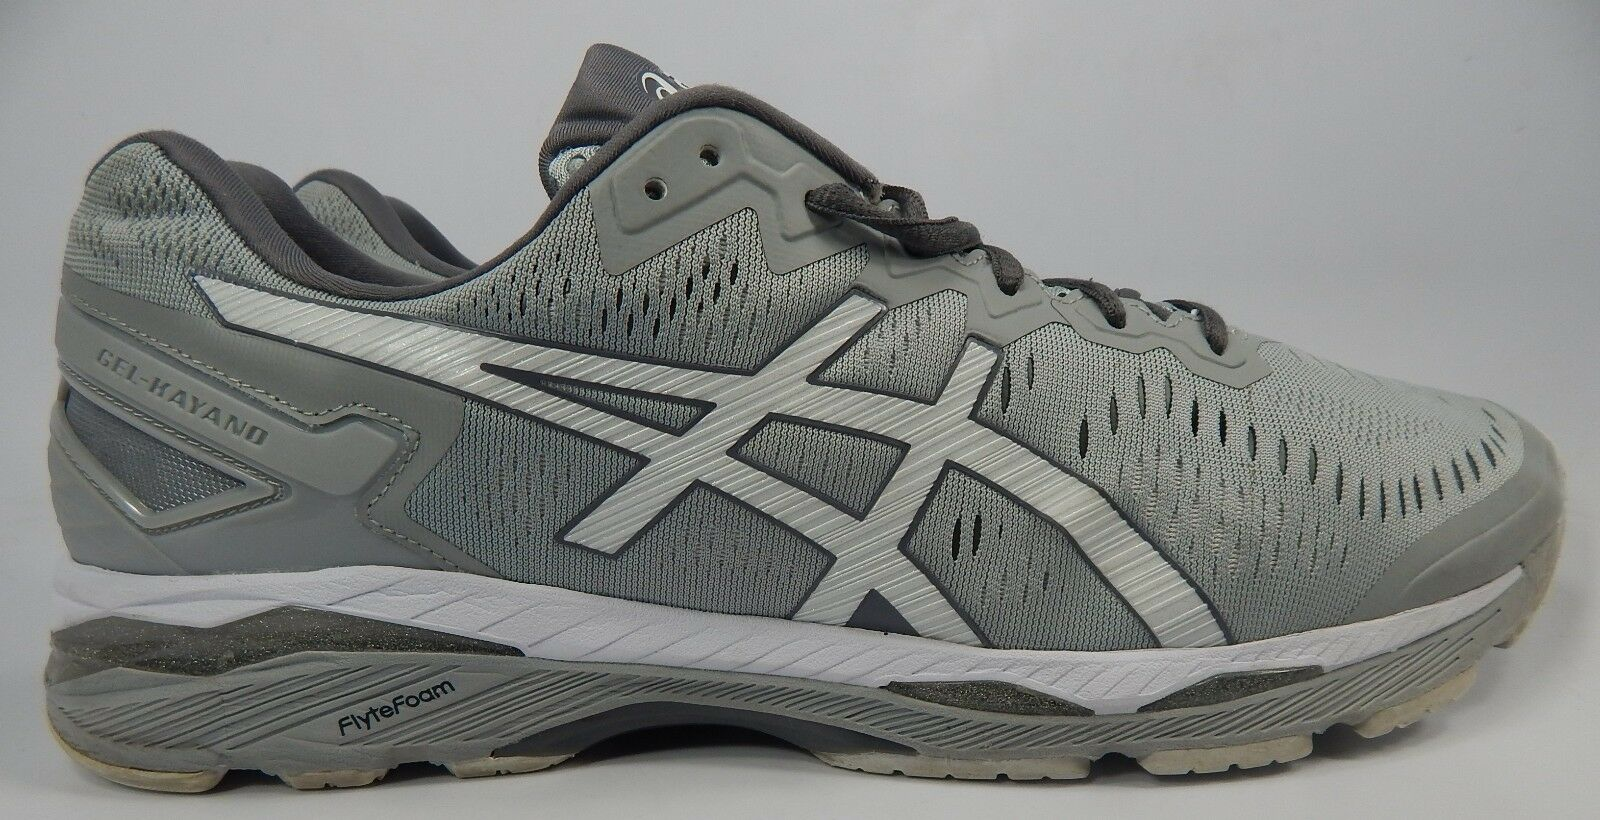 Asics Gel Kayano 23 Size US 14 M (D) Men's Running Shoes Gray White T646N